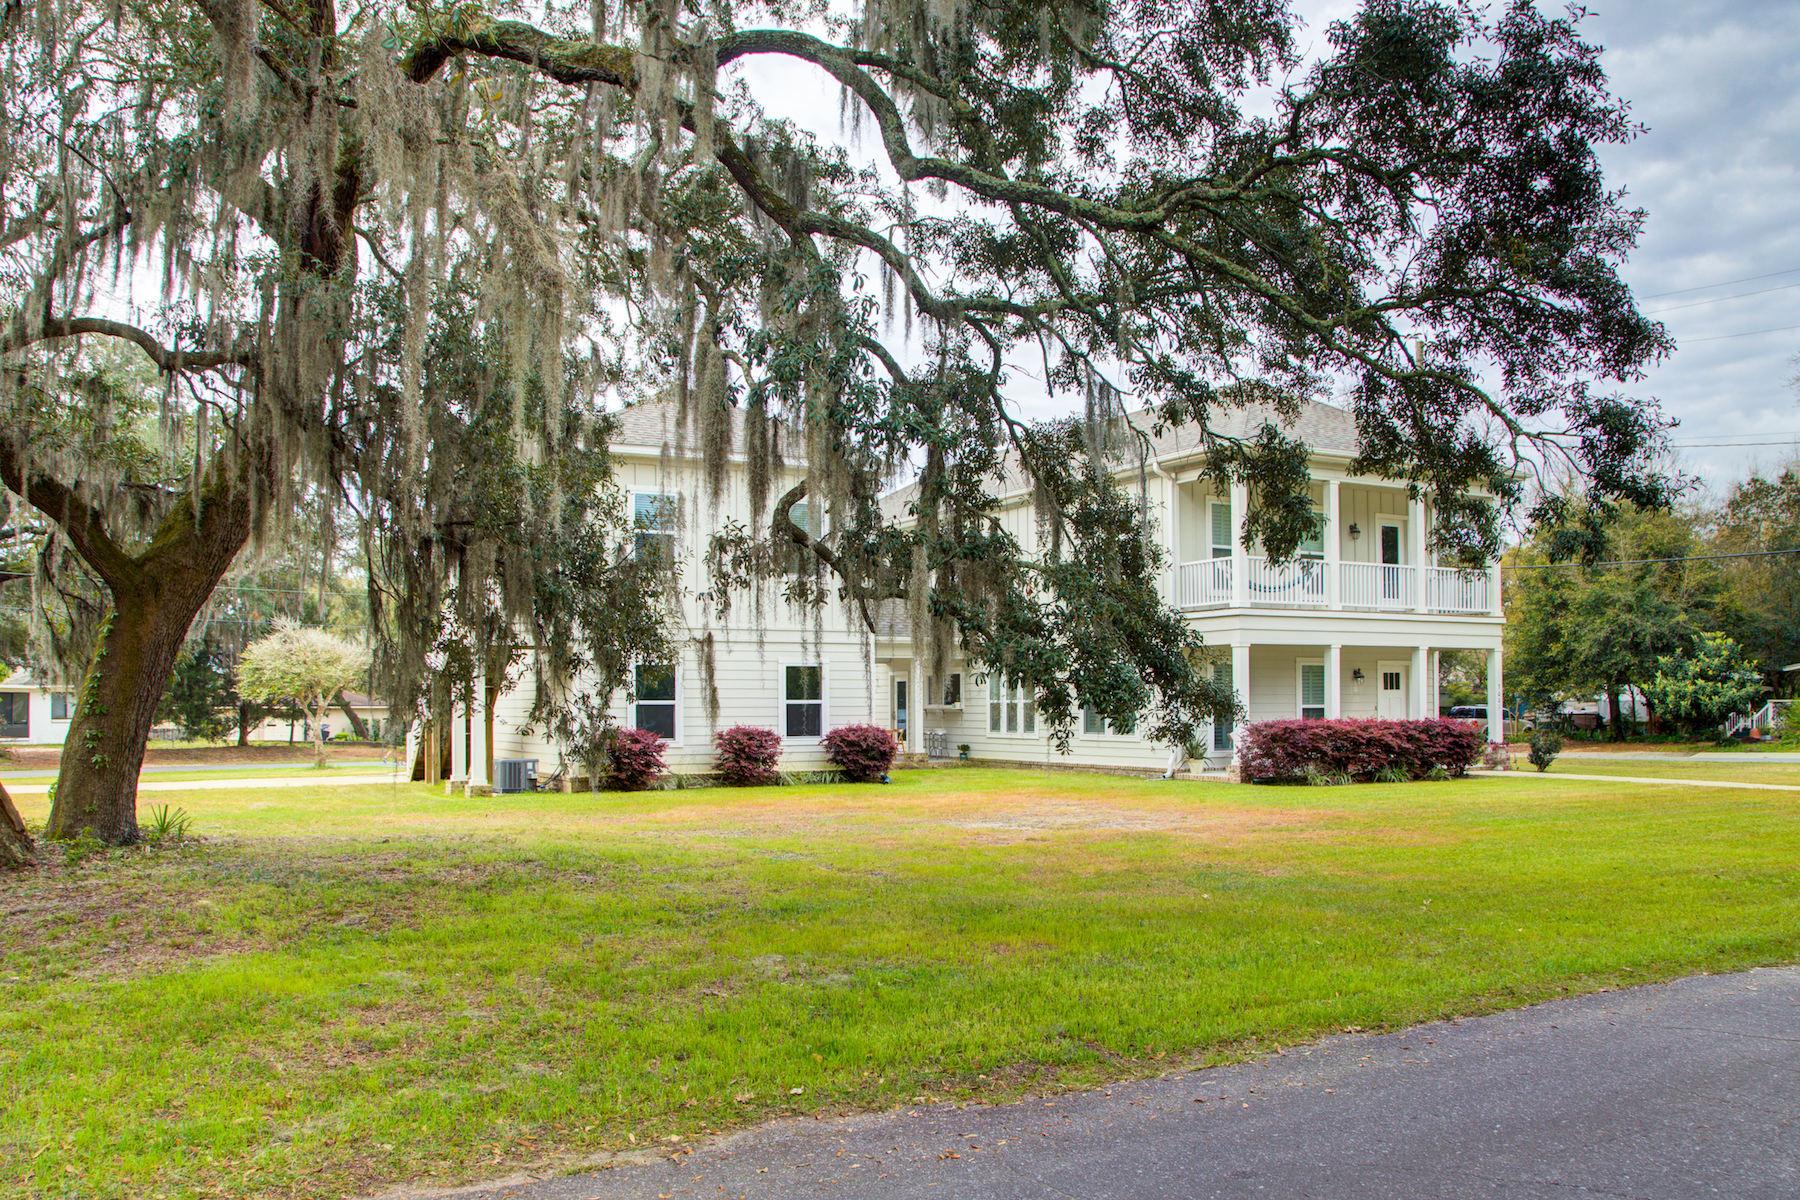 Single Family Homes のために 売買 アット Casa de Luna 3001 E Jackson St., Pensacola, フロリダ 32503 アメリカ